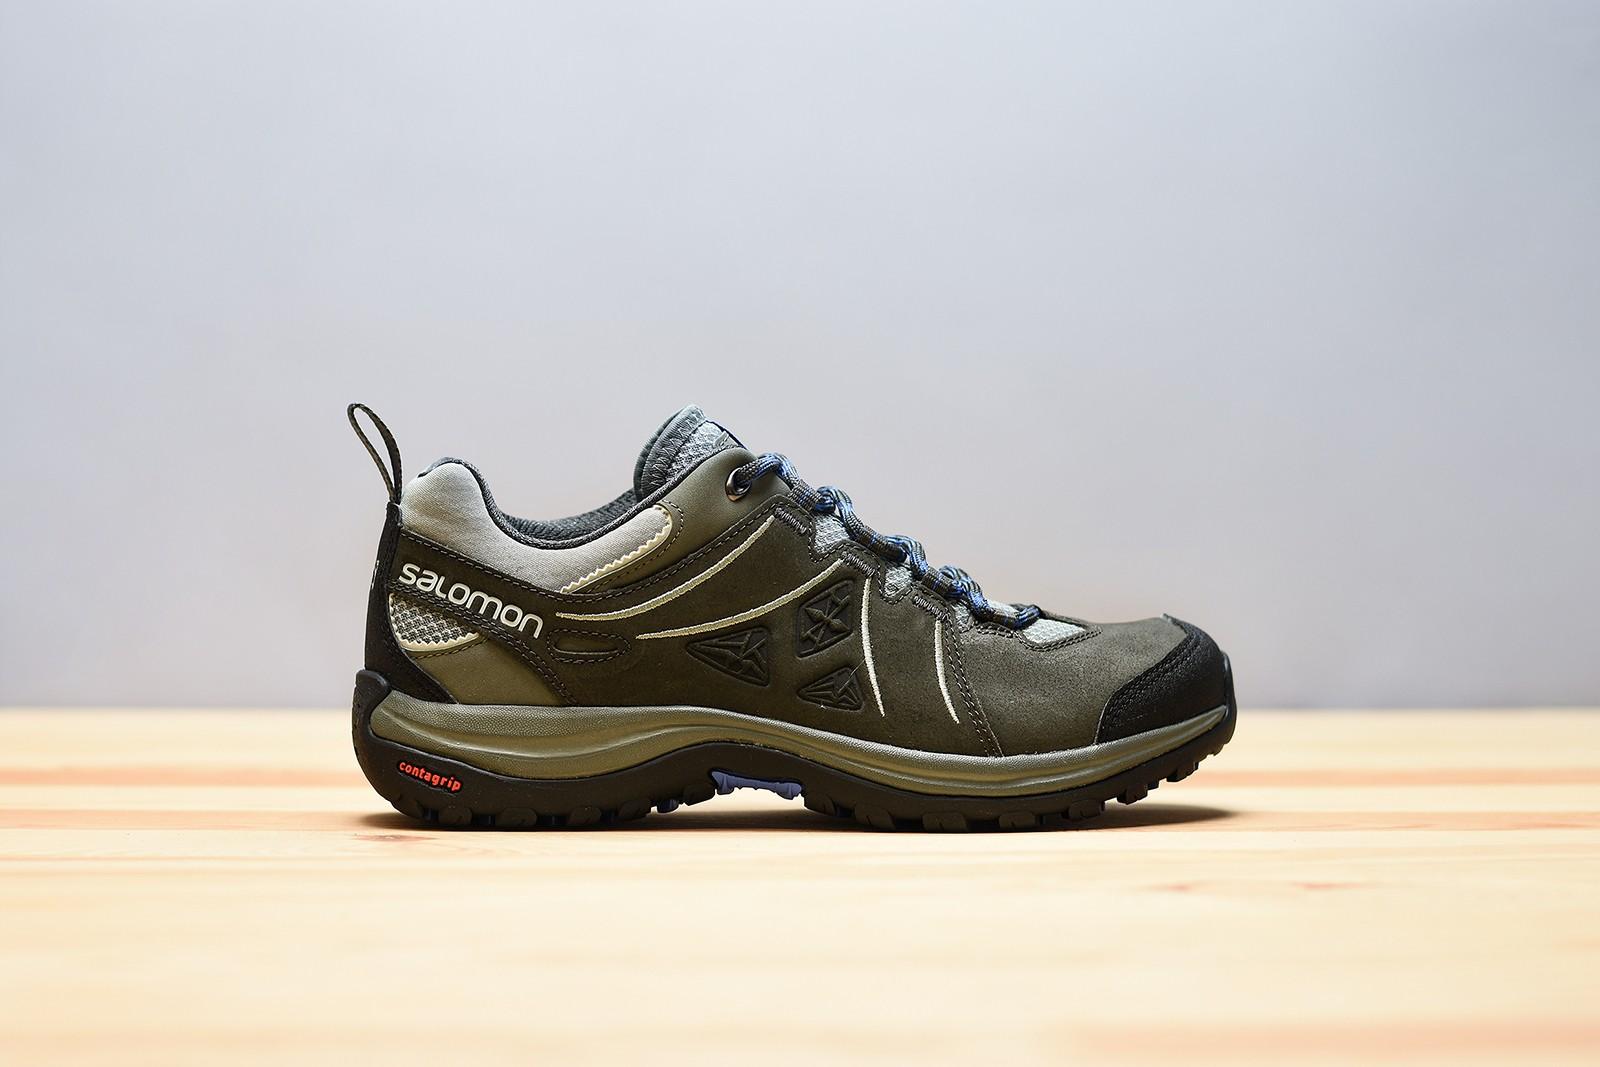 63b120d461031 Dámská Treková obuv Salomon ELLIPSE 2 LTR W SHADOW/Beluga/   D-Sport